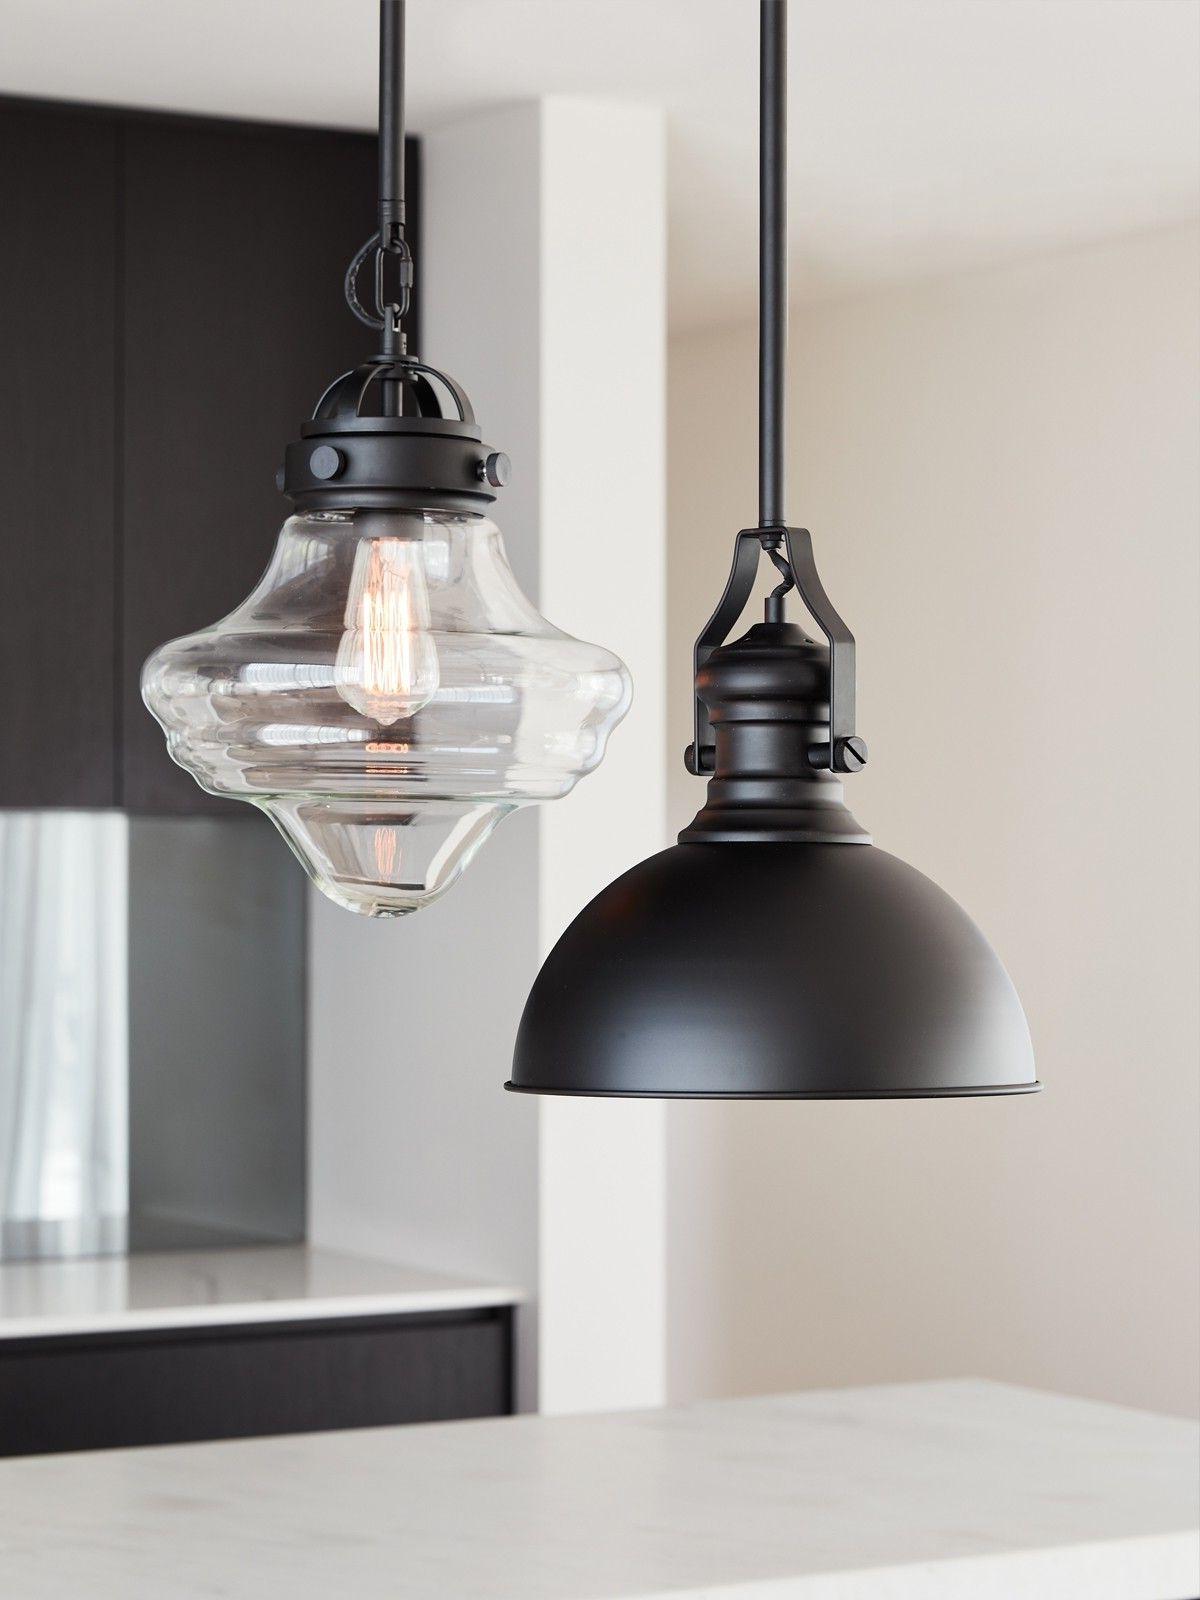 Hamilton 1 Light Single Dome Pendants Throughout Fashionable Hamilton 1 Light Pendant In Black (Gallery 9 of 25)